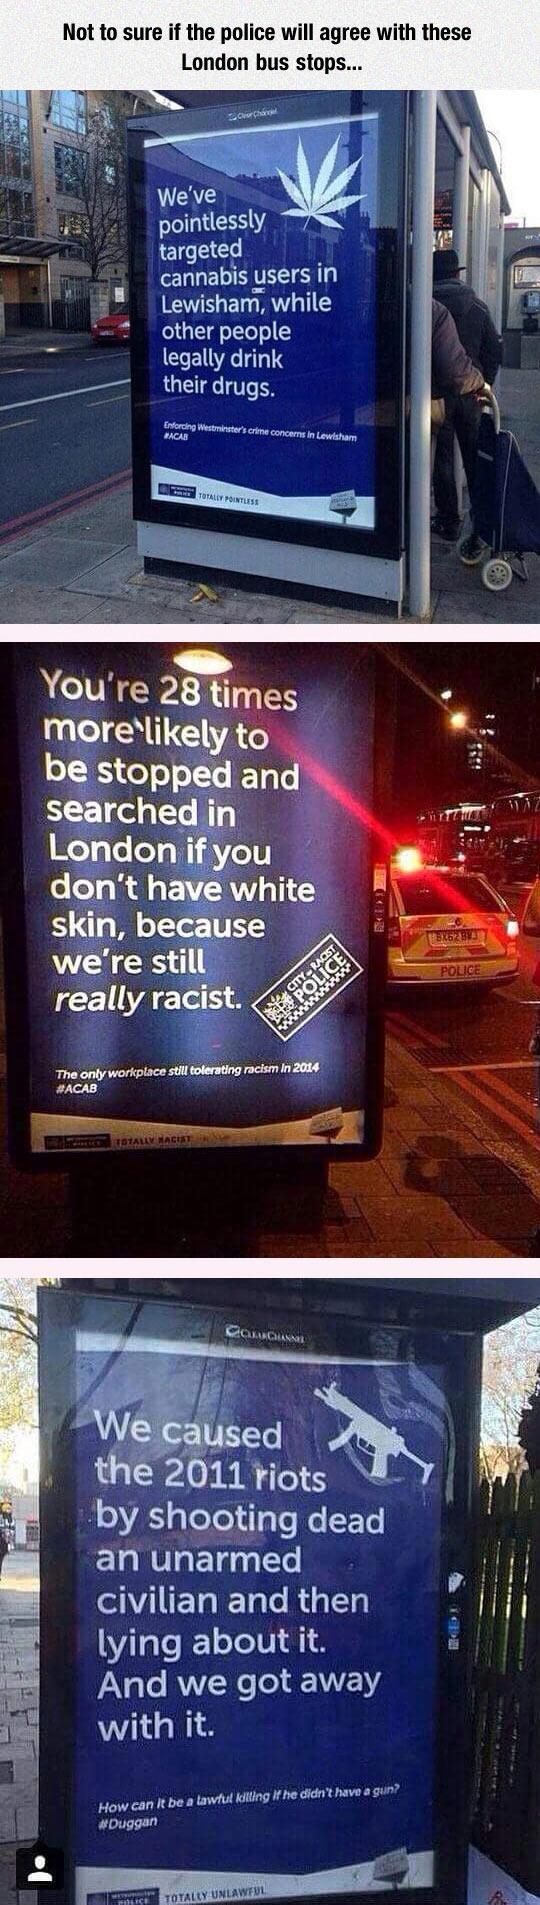 London Bus Stops Send A Message